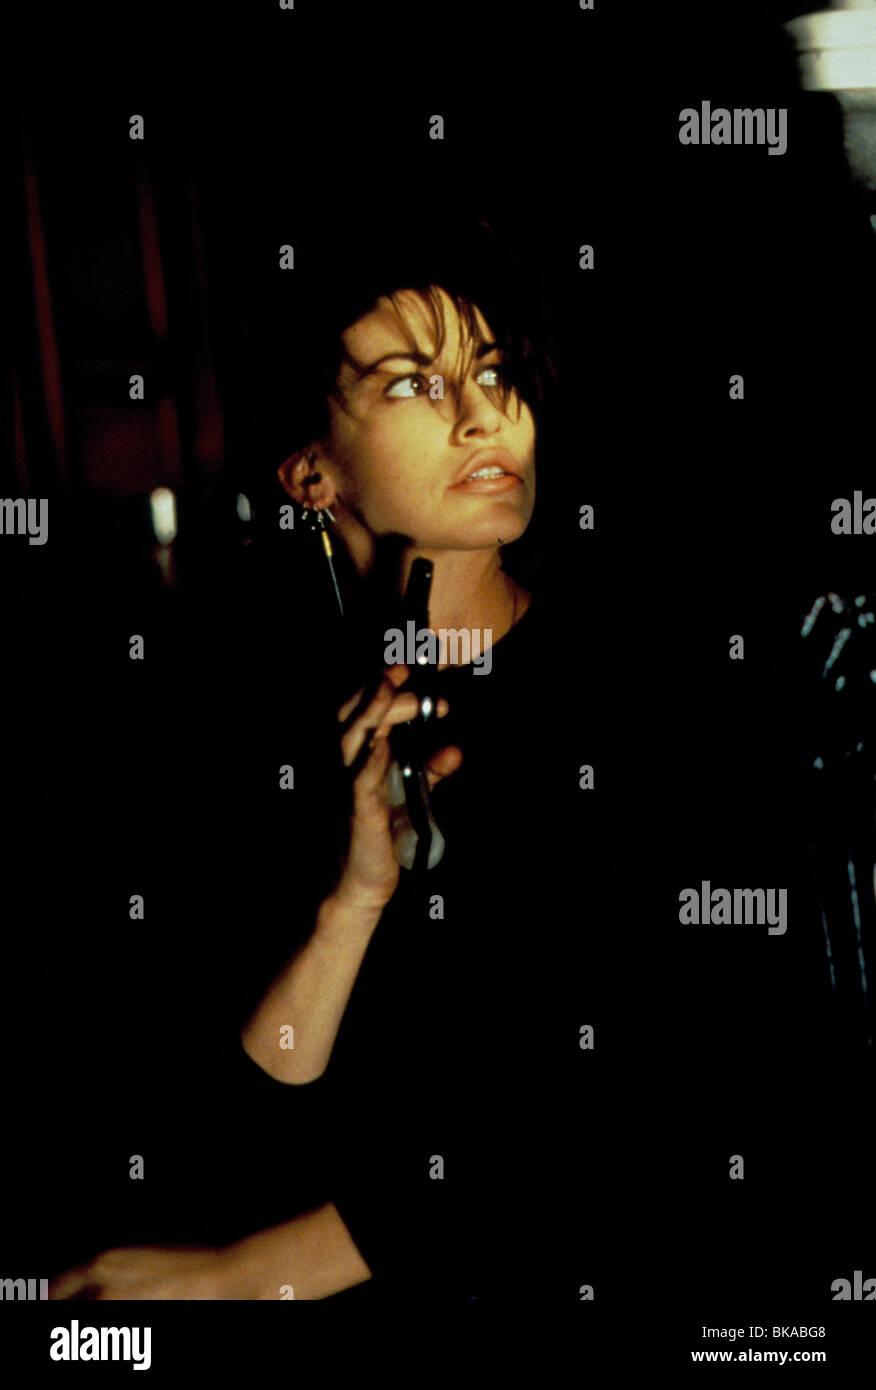 BOUND -1996 GINA GERSHON - Stock Image